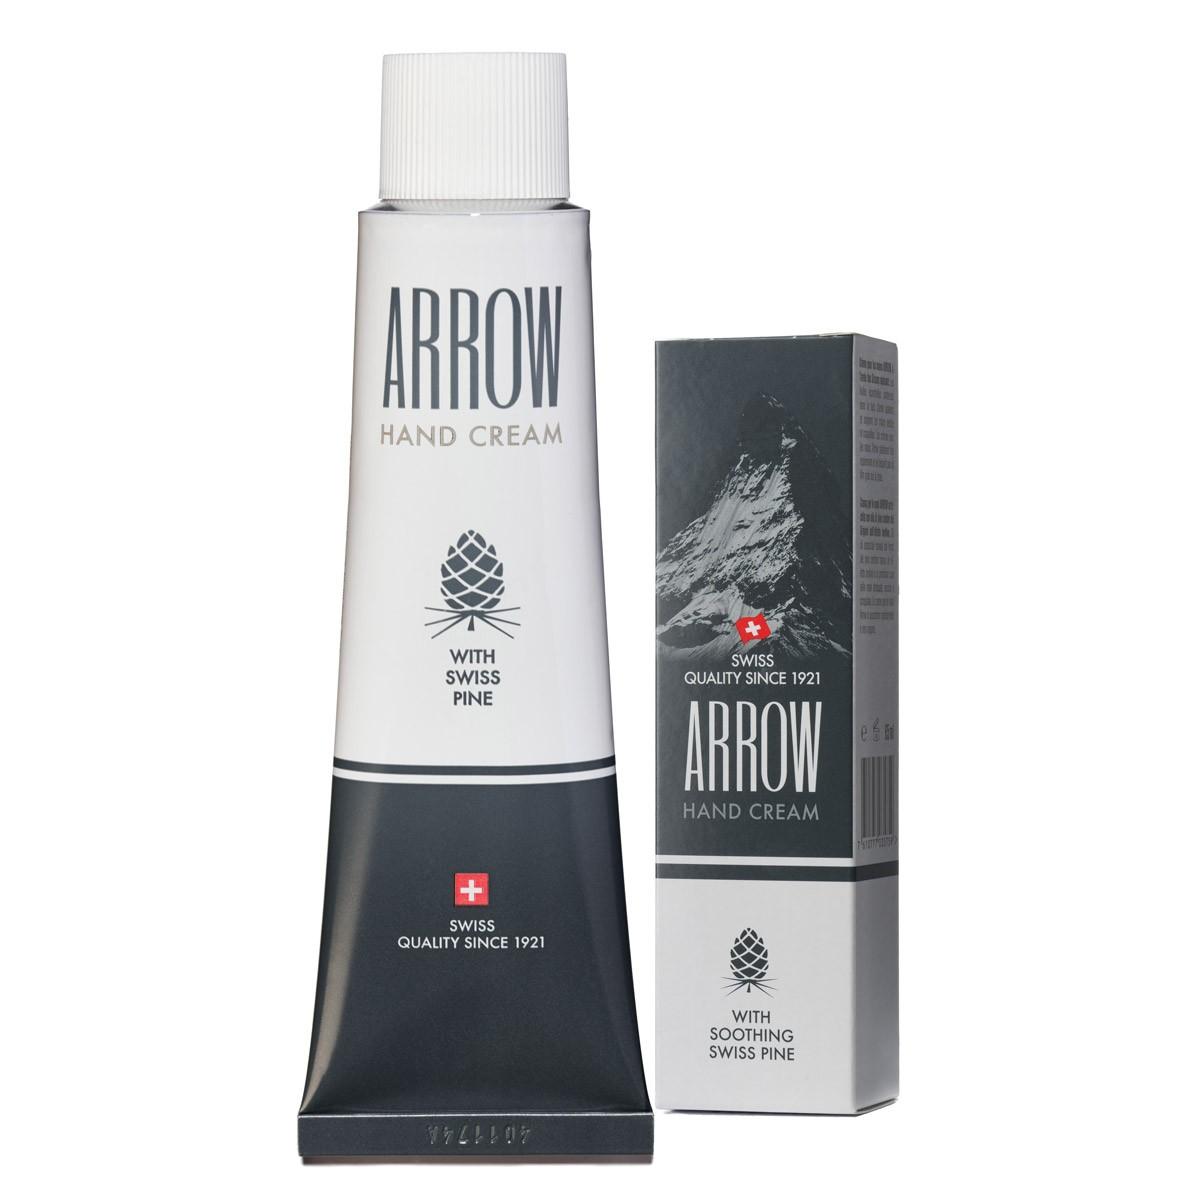 Arrow - Hand Cream with Swiss Pine (65 ML)